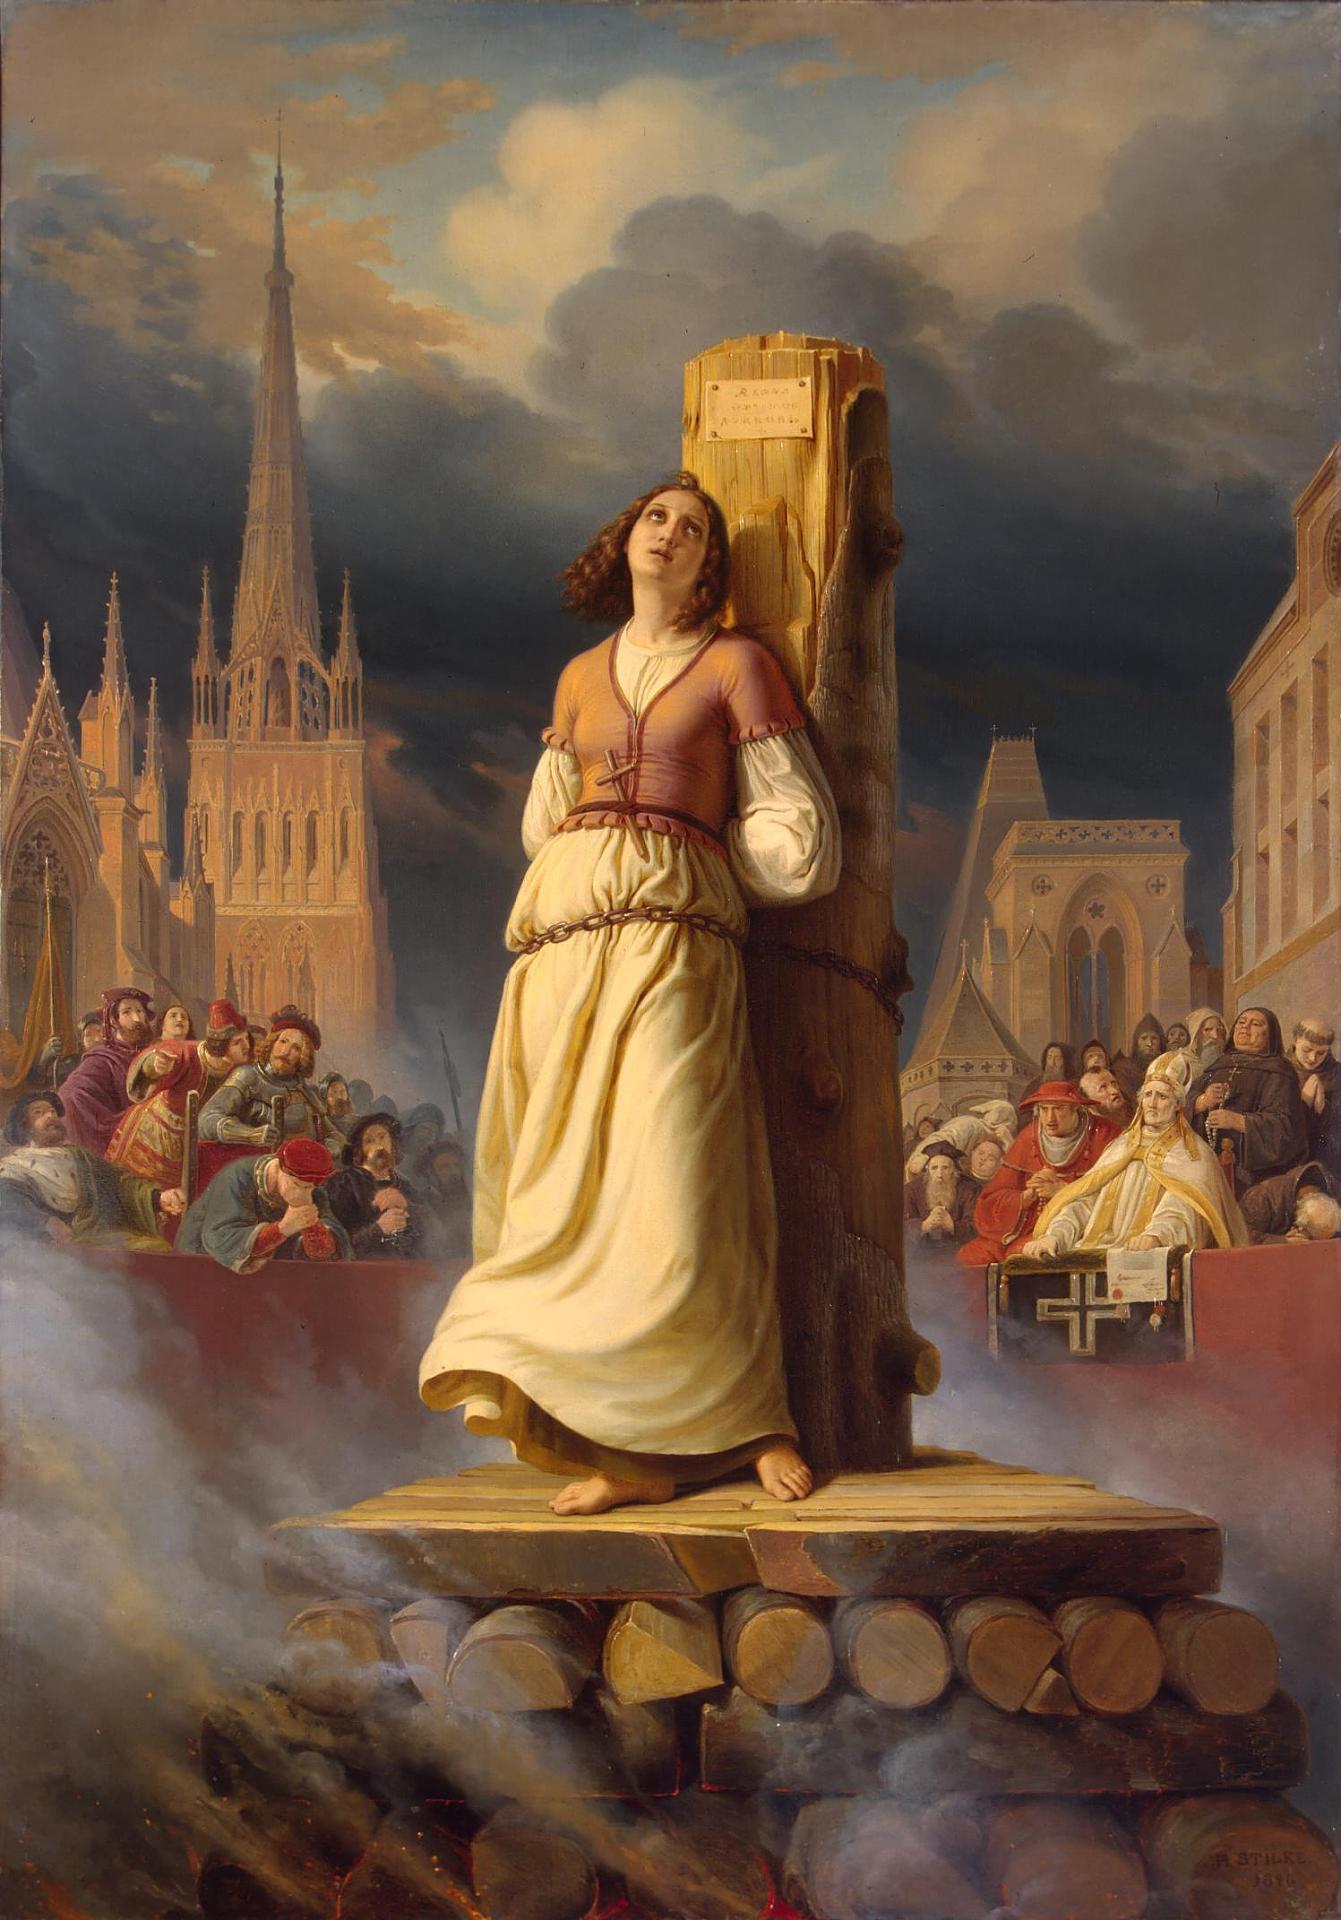 Stilke_Hermann_Anton_-_Joan_of_Arc's_Death_at_the_Stake.jpg